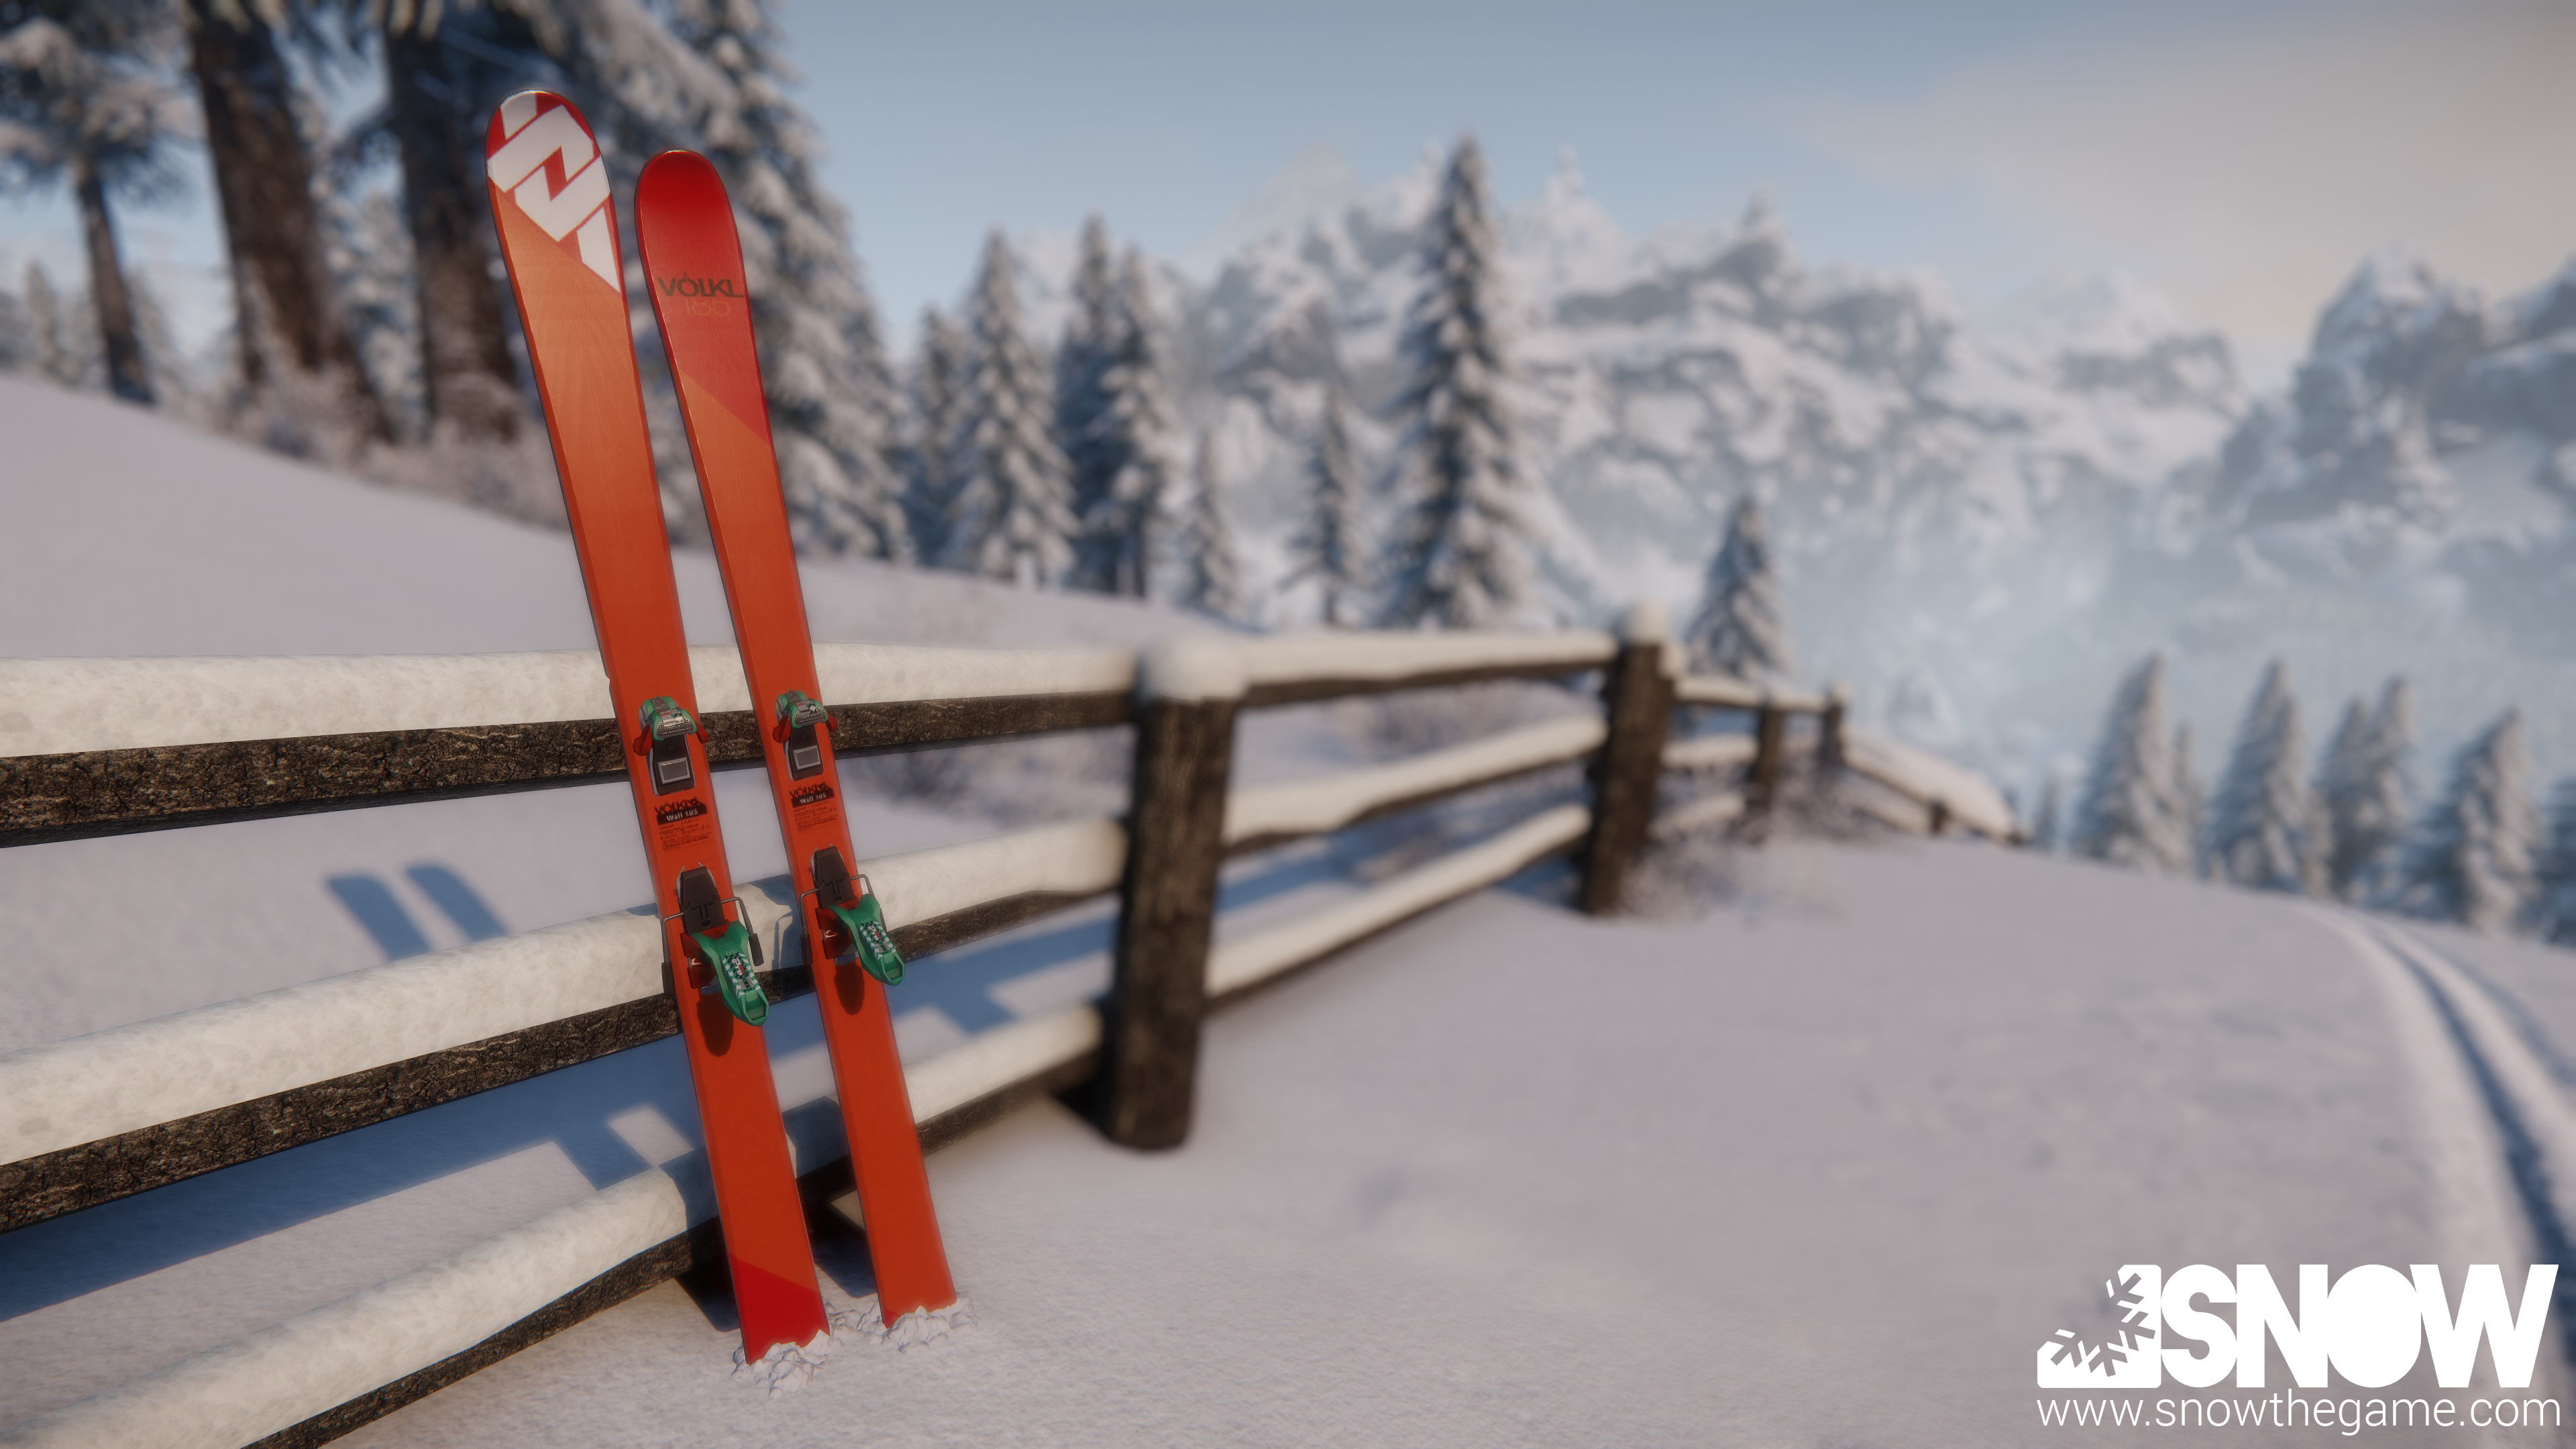 Nové obrázky z adrenalinového SNOW 88126